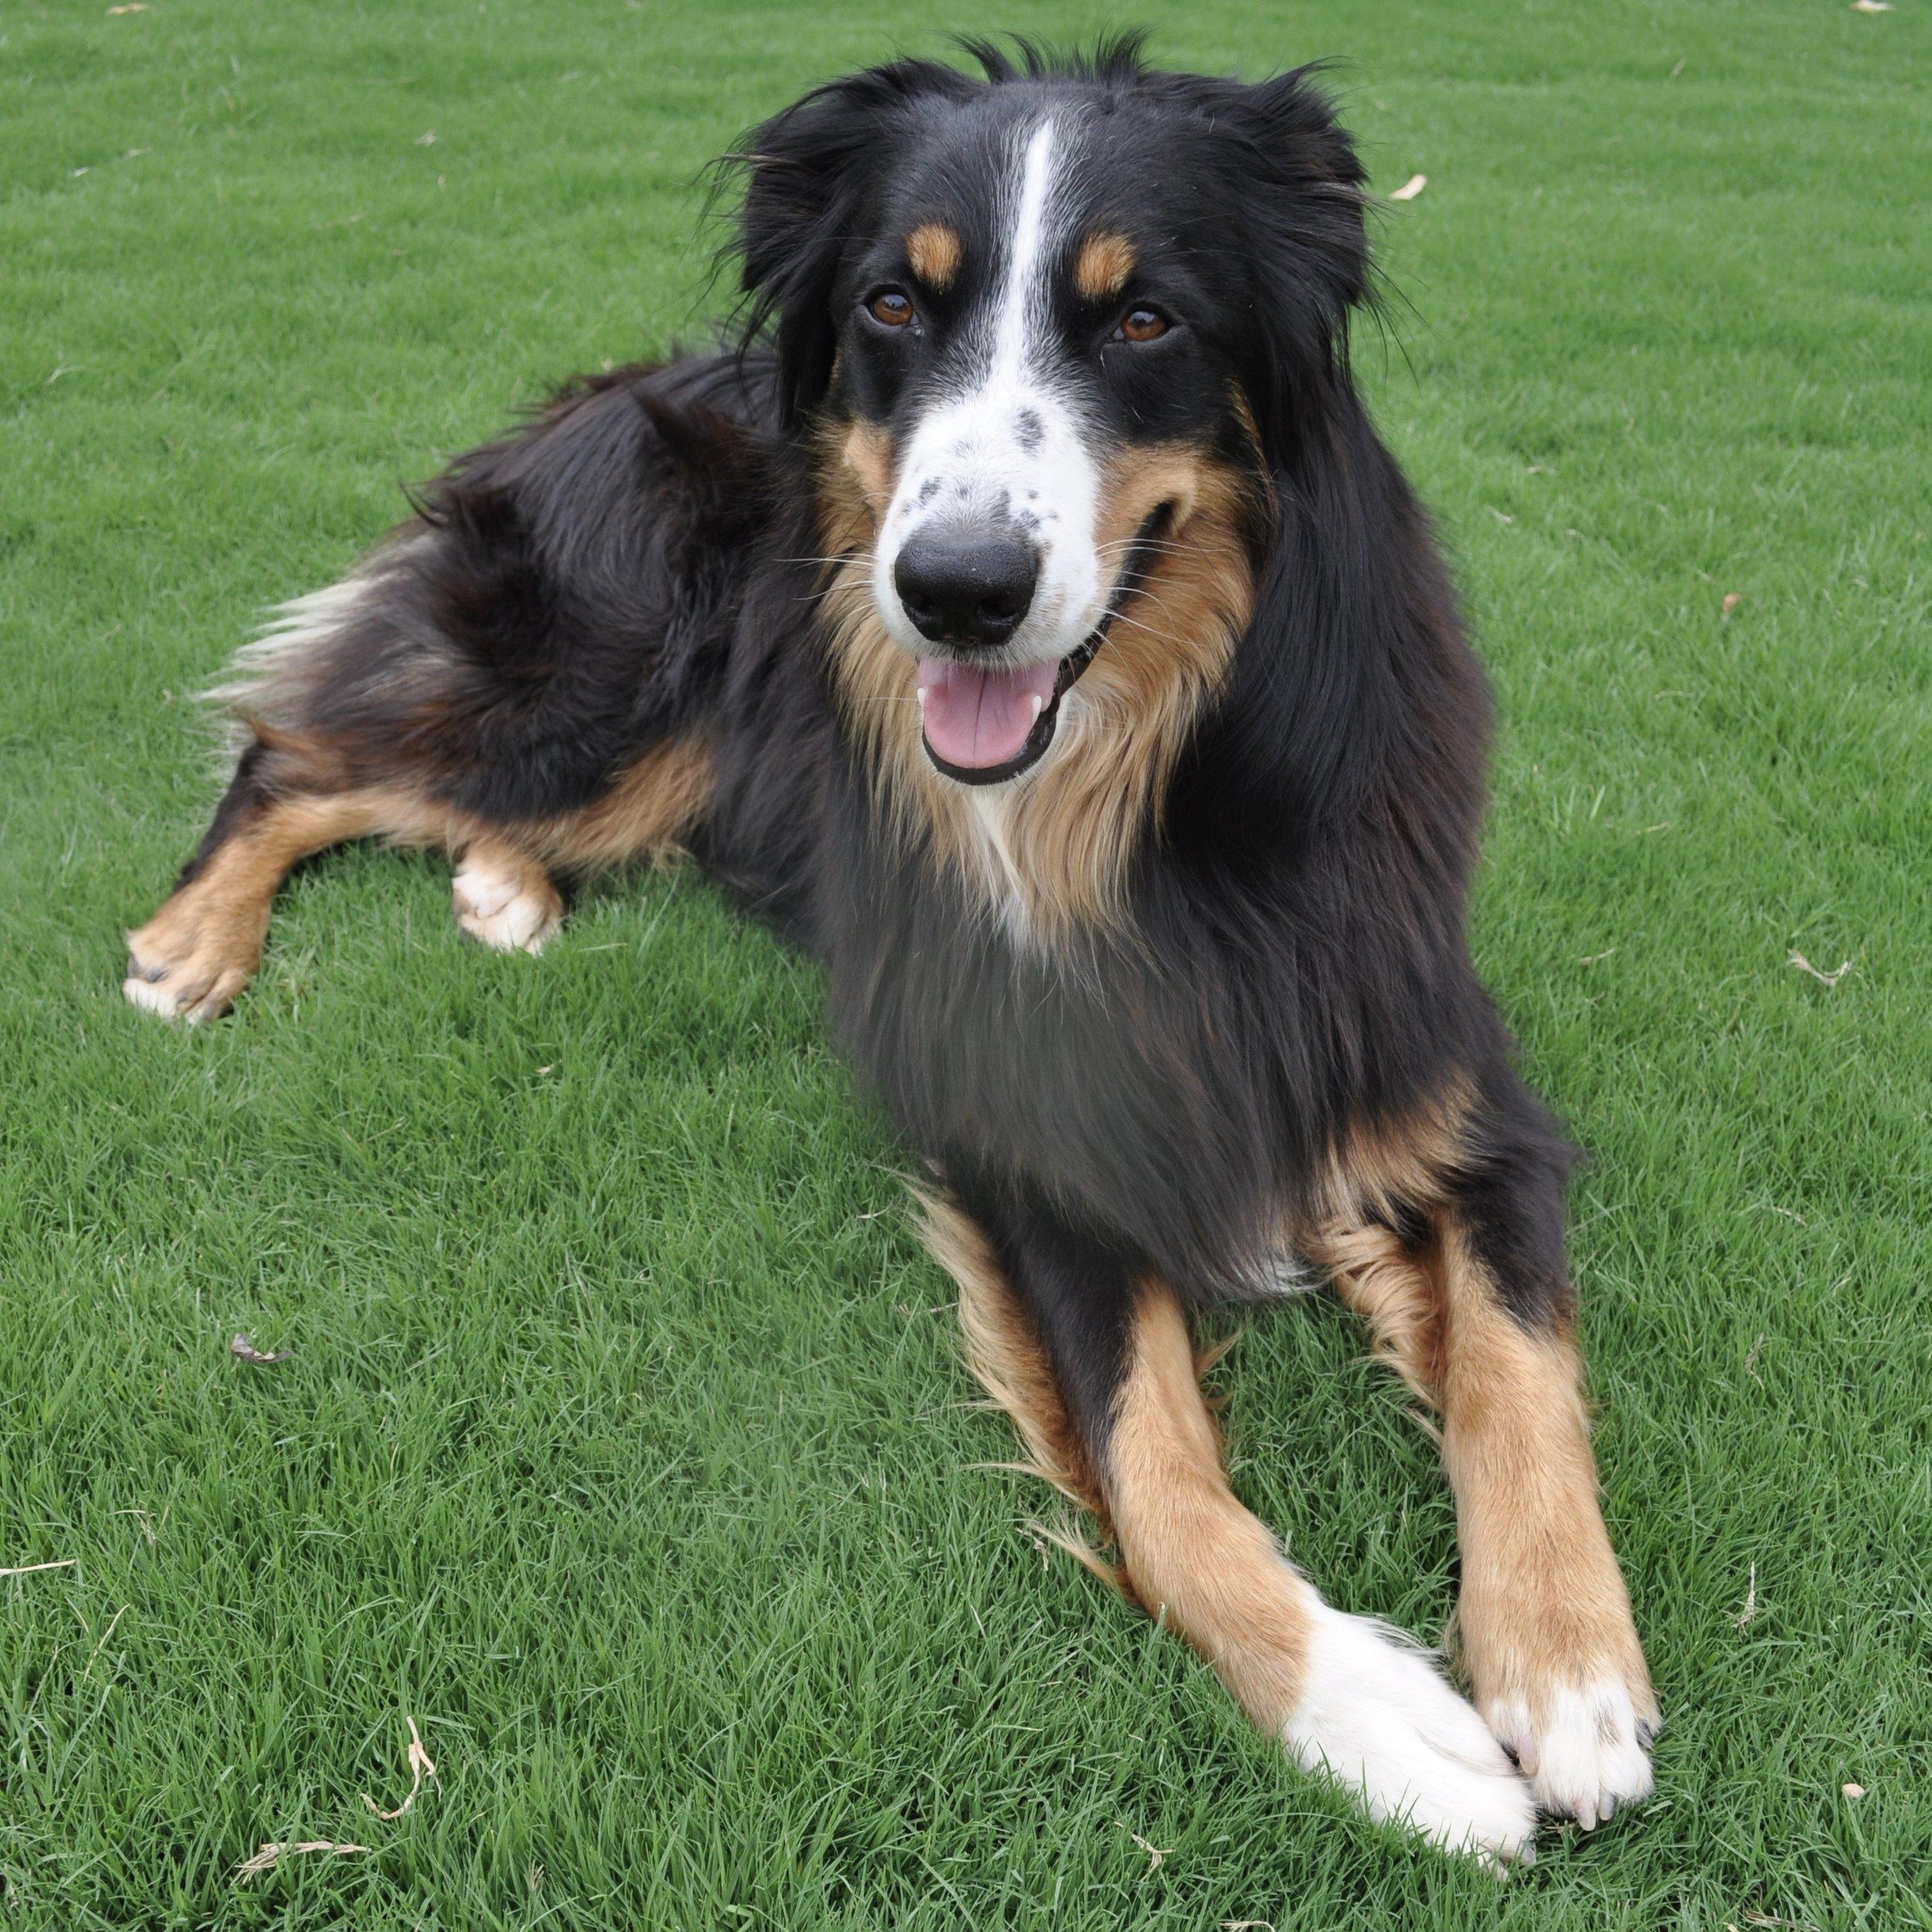 Meet Awesome Oscar - Shop dog extraordinaire